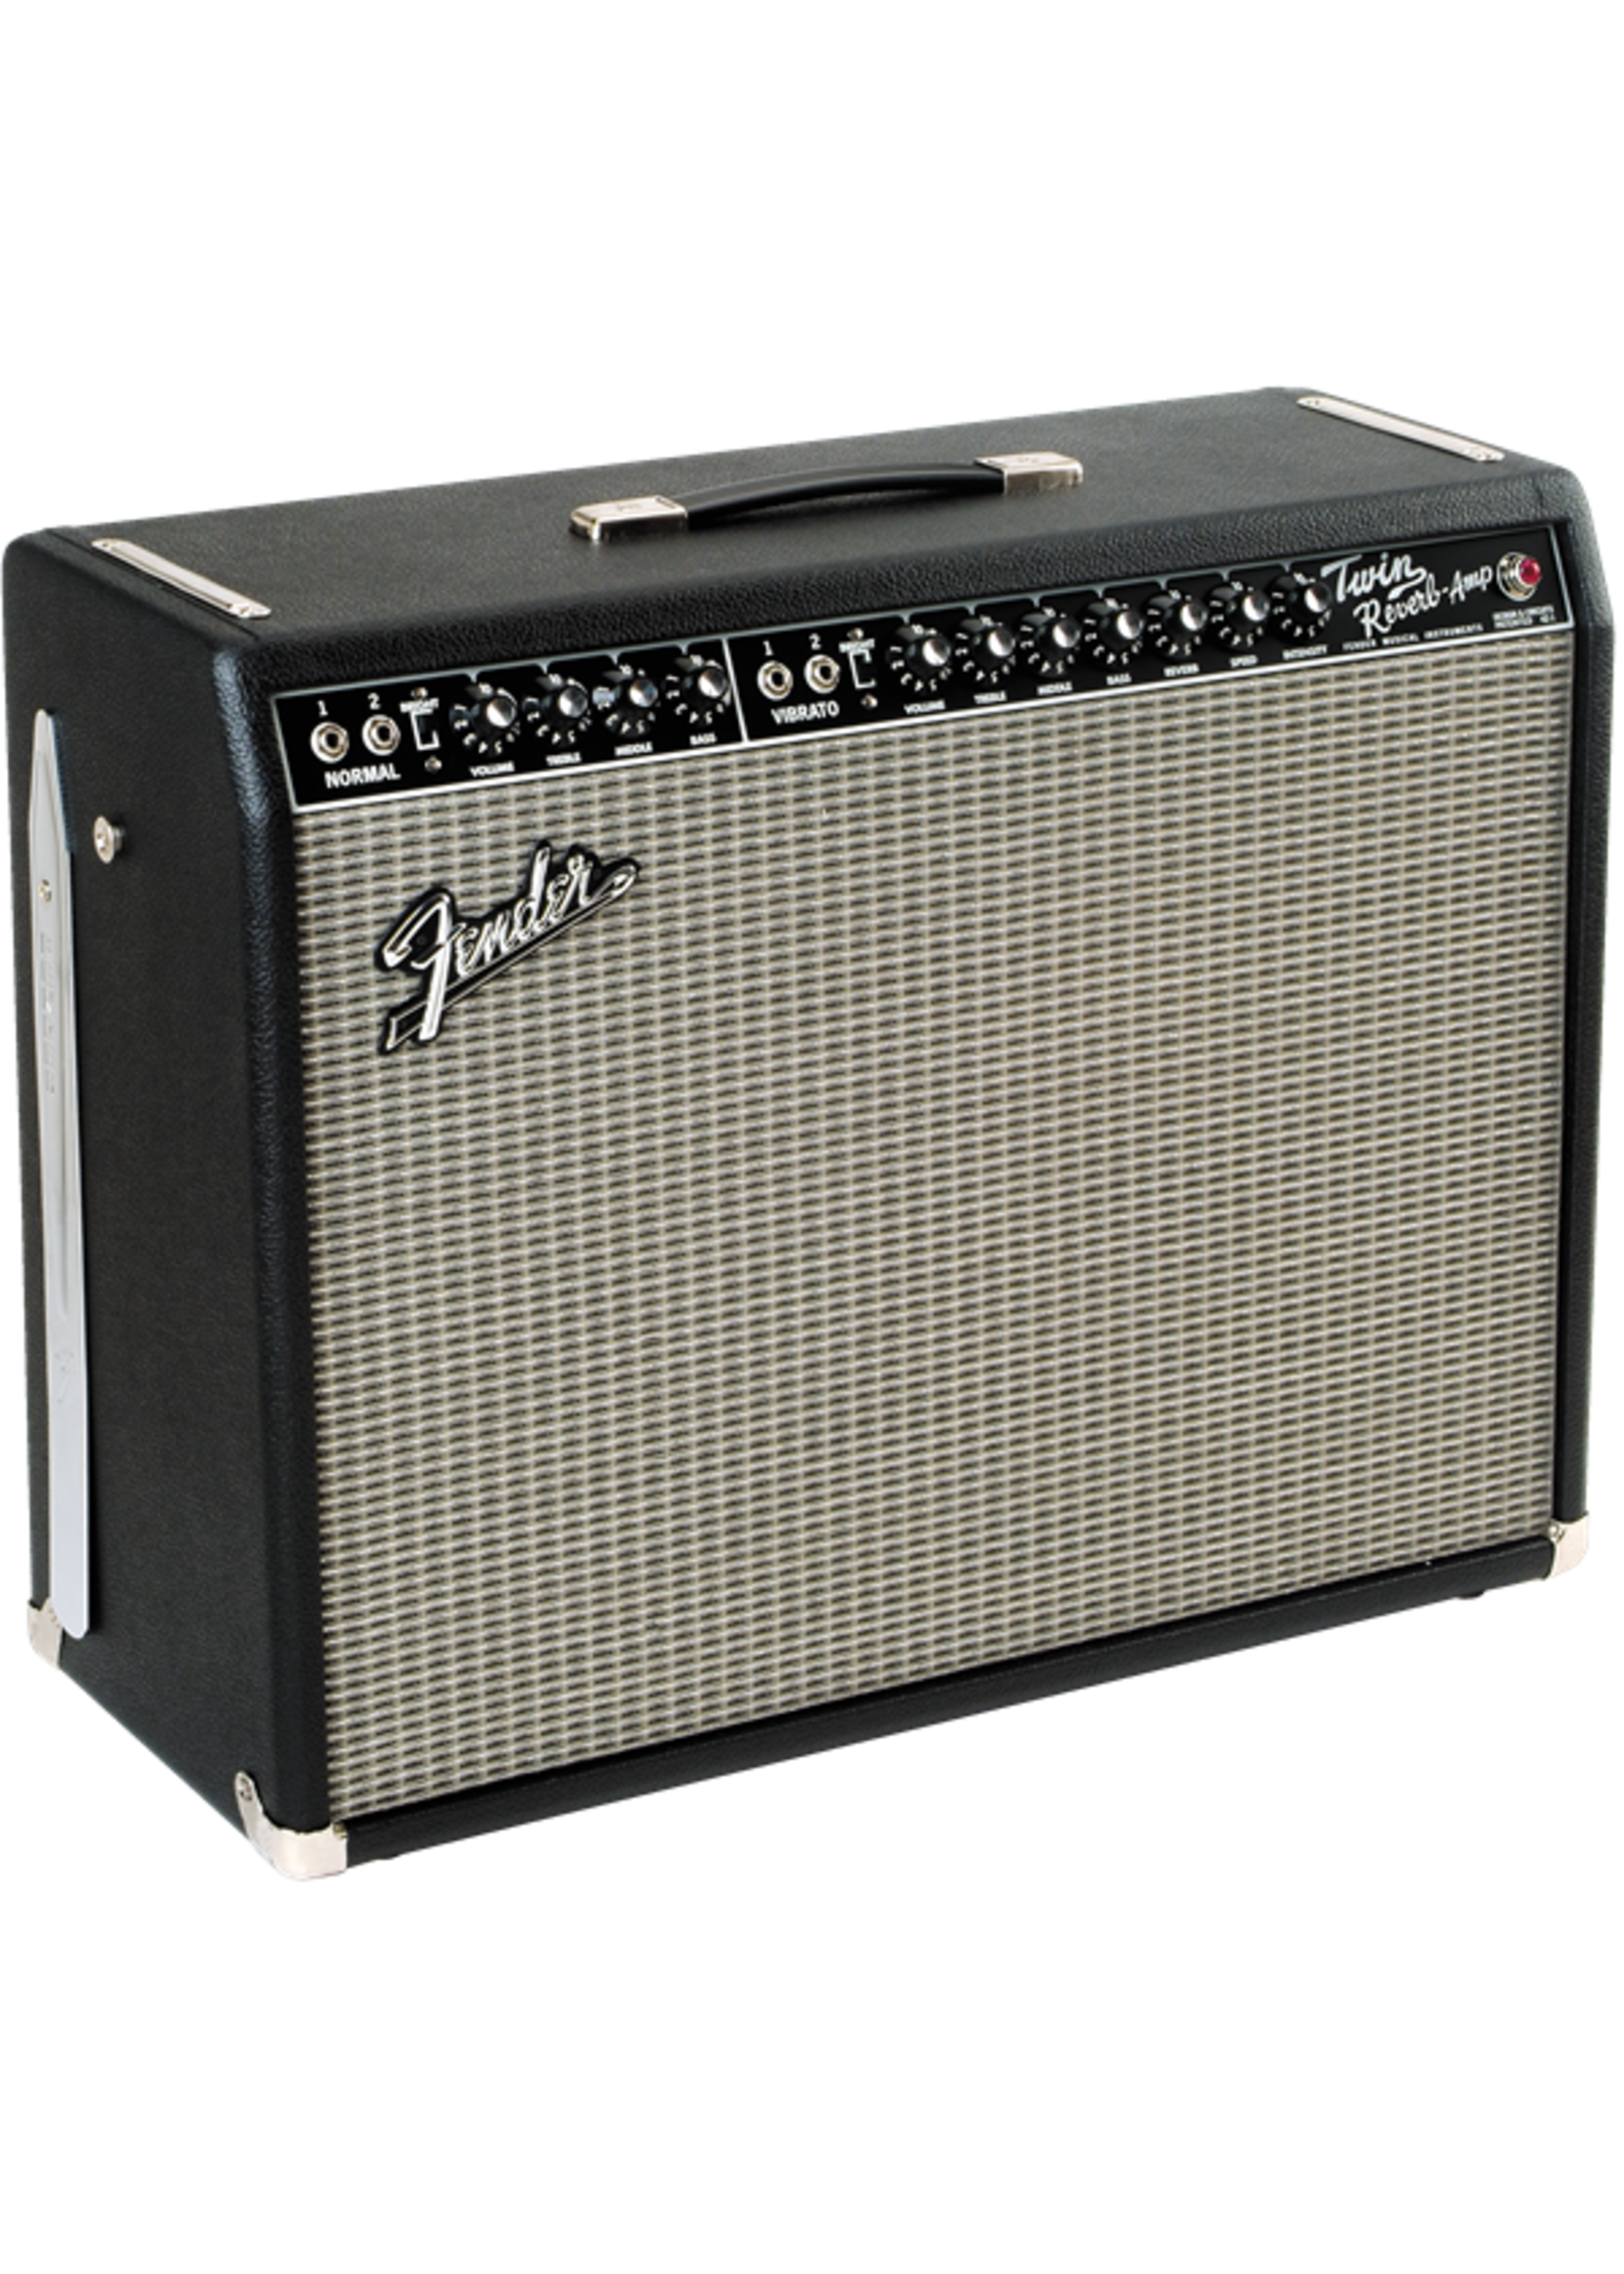 Fender Fender '65 Twin Reverb 120V 85-Watts Guitar Combo Amp Black/Silver